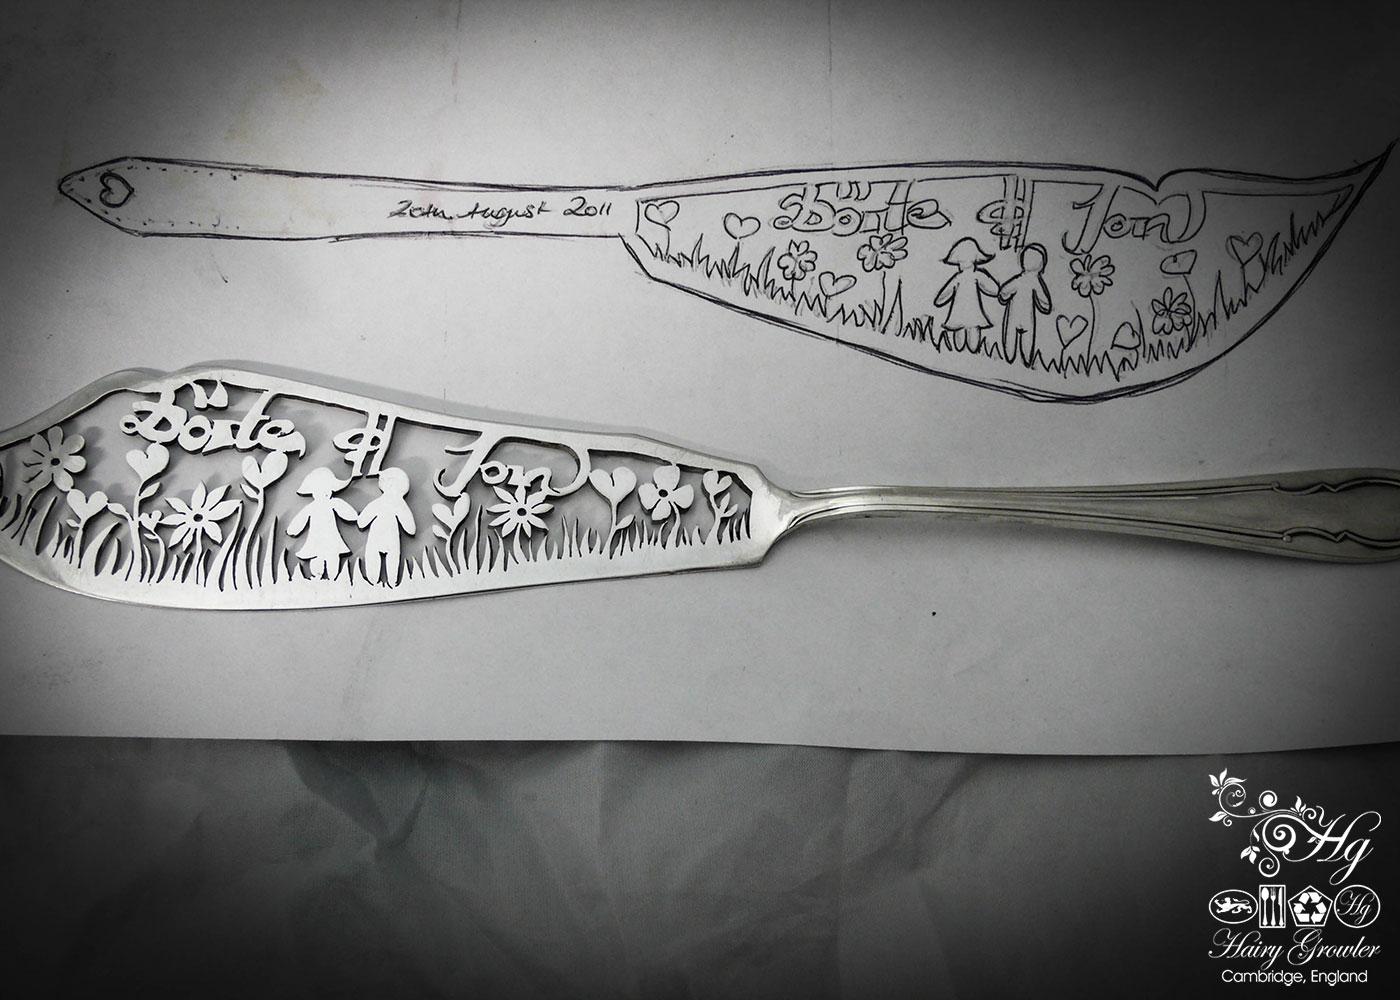 handmade and recycled bespoke wedding-cake-knife